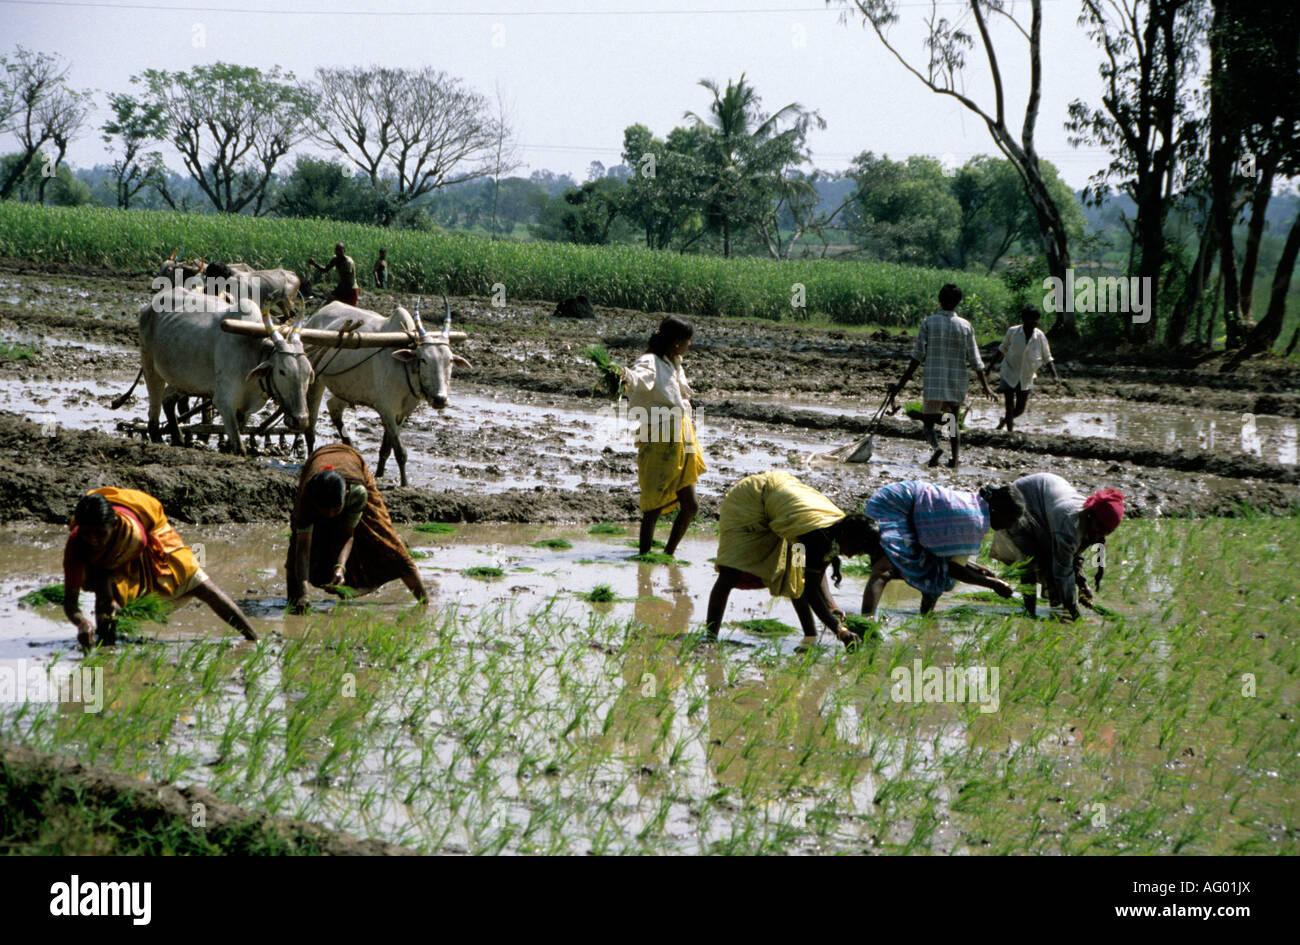 village life in india essay